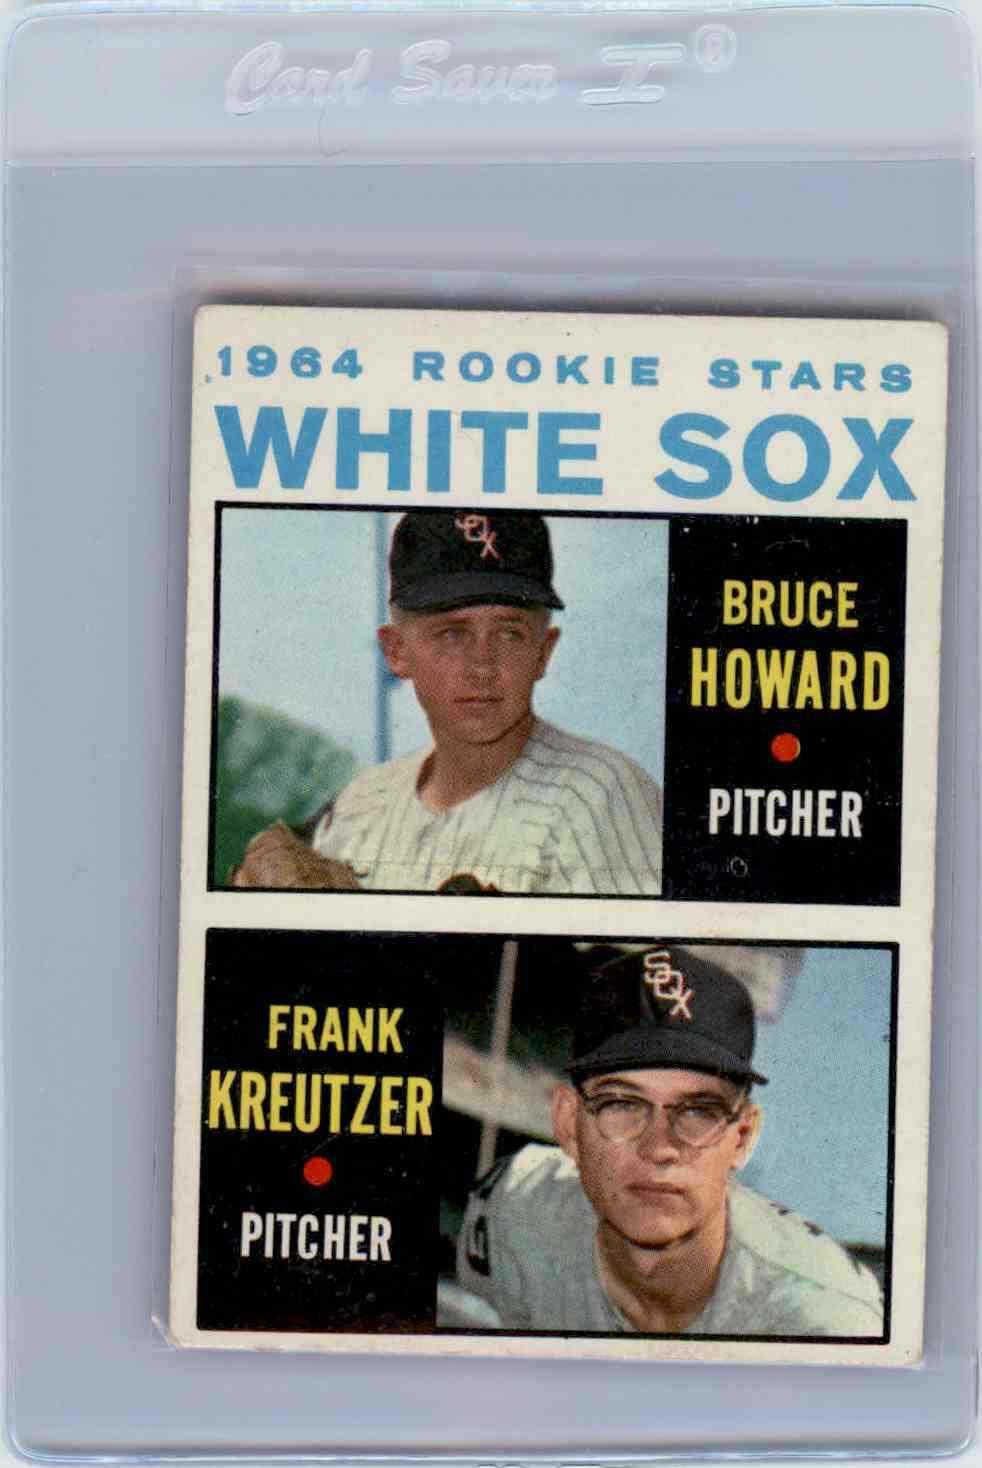 1964 Topps White Sox Rookies Bruce Howard,Frank Kreutzer #107